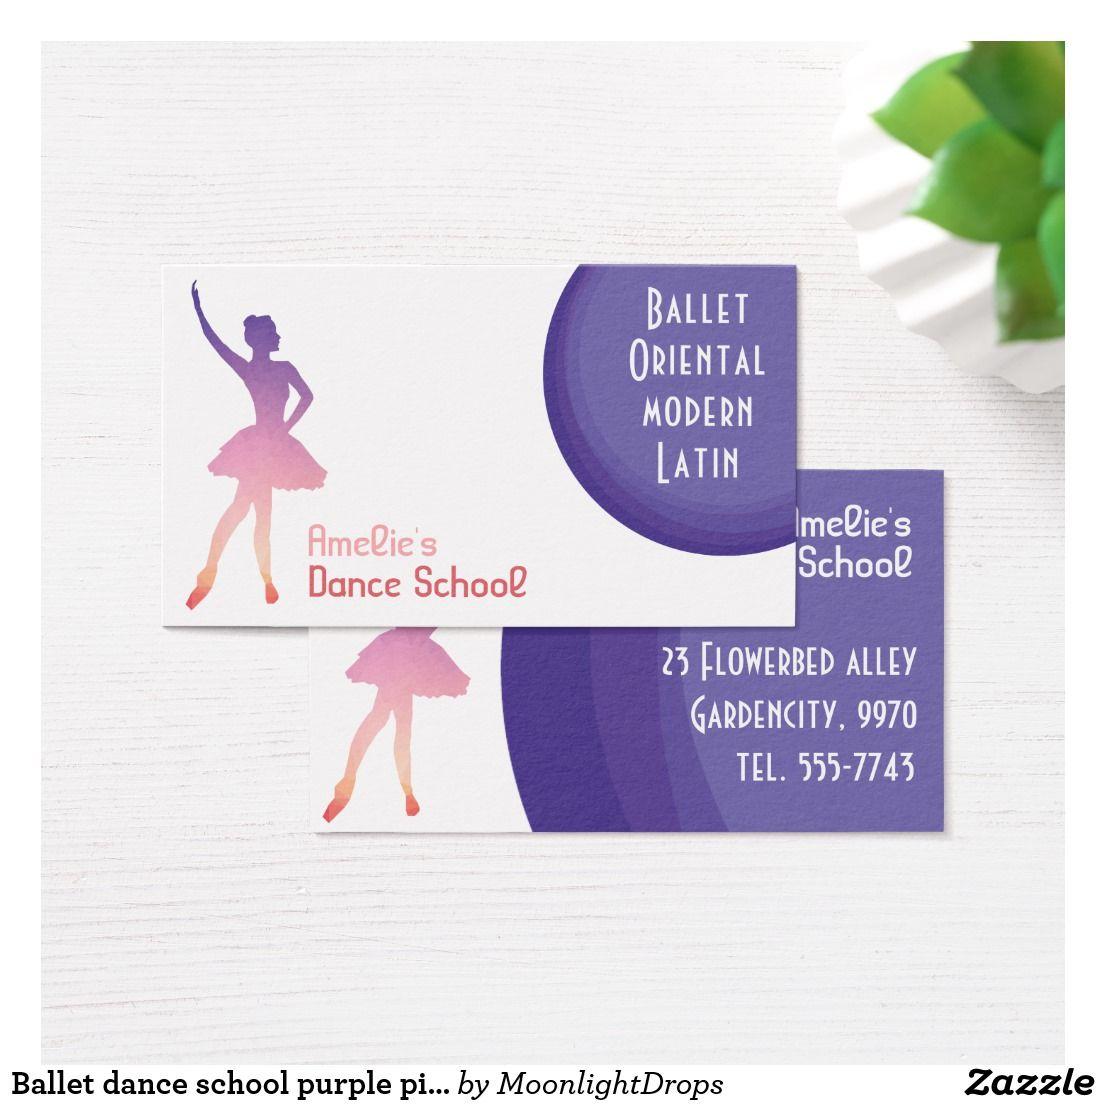 Ballet Dance School Purple Pink Business Card Zazzle Com In 2020 Pink Business Card Dance School Business Card Design